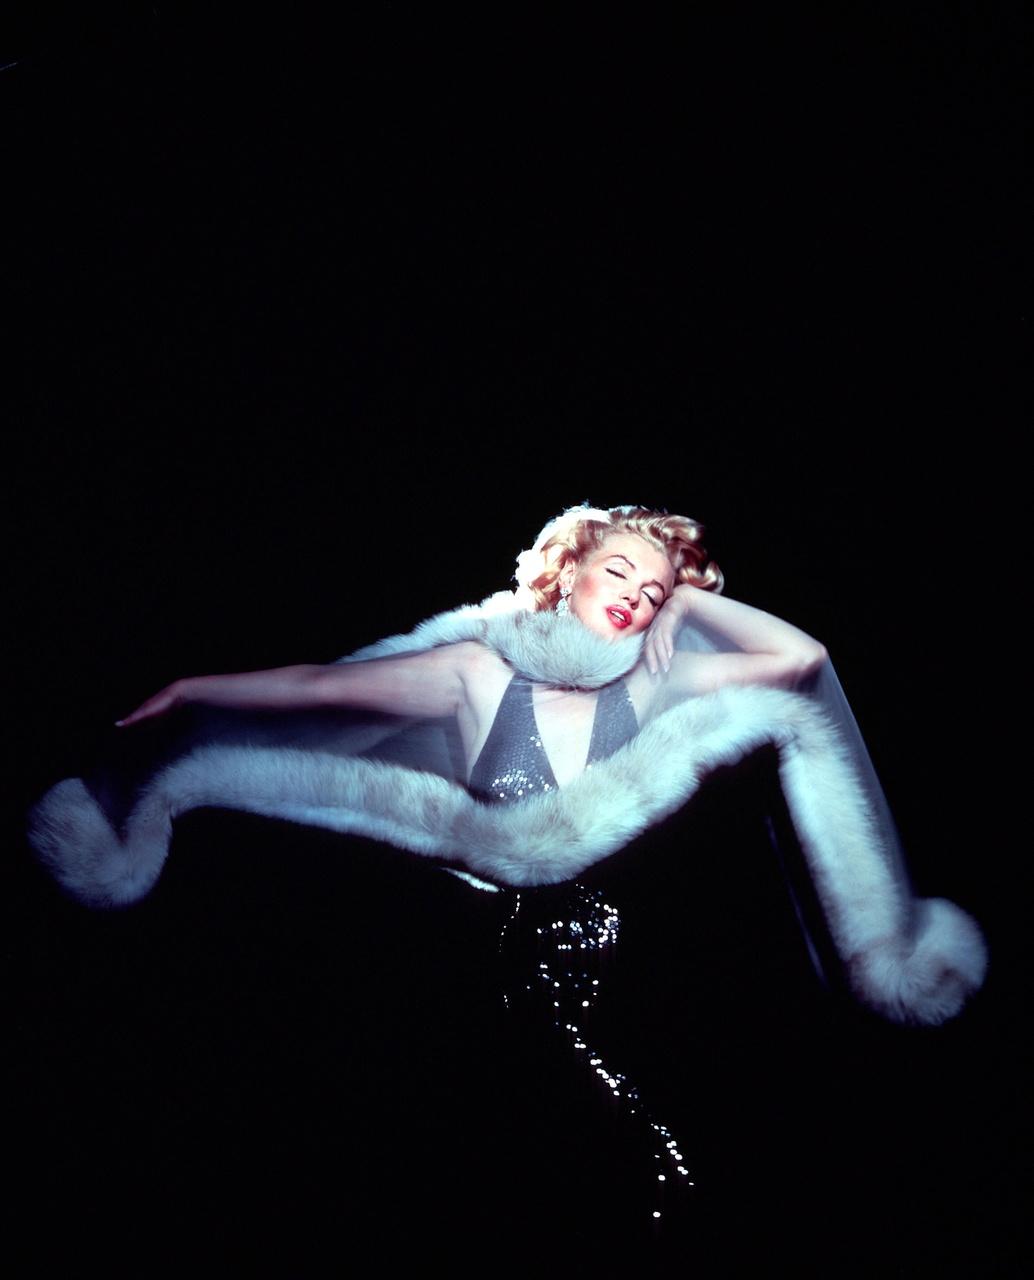 http://3.bp.blogspot.com/_FEkxtl1-FKs/THN8jGVJaRI/AAAAAAAAAM4/k9G8SdfpYf8/s1600/Marilyn+Monroe,+1957.jpg